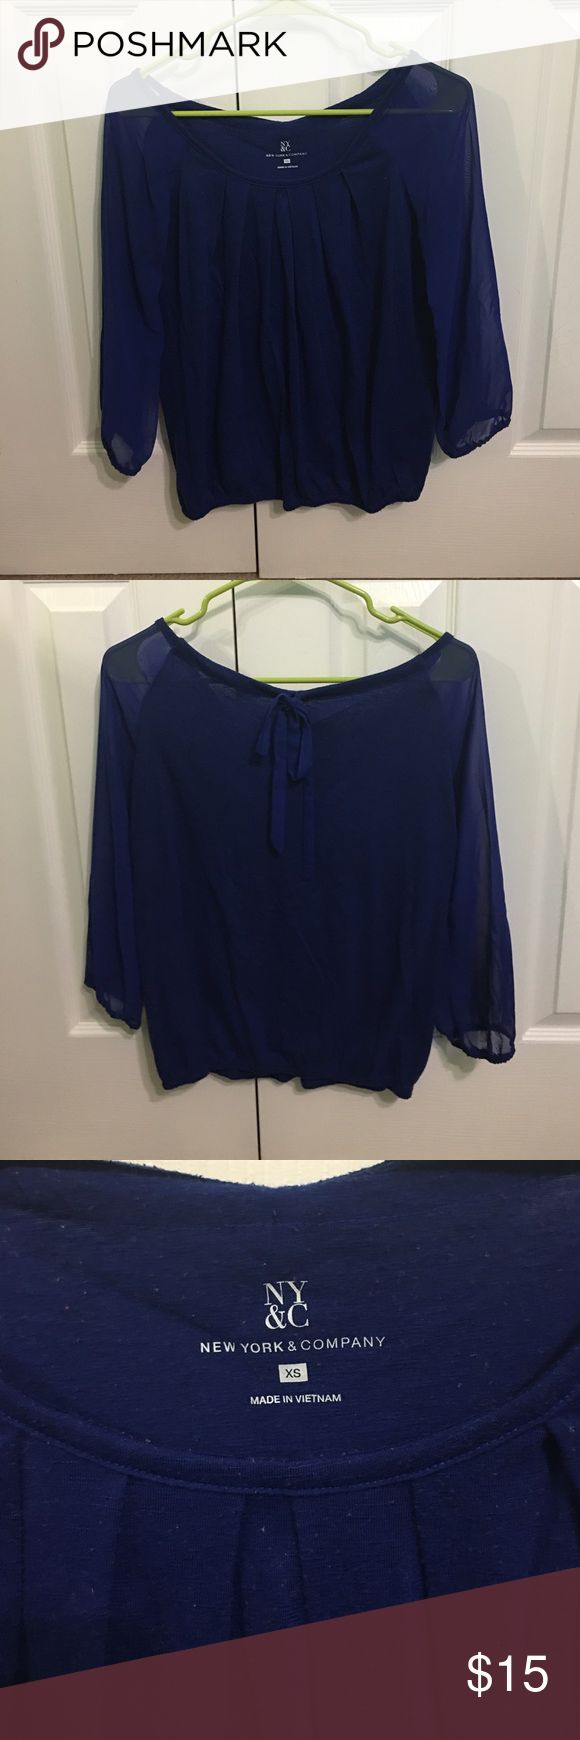 Royal Blue Blouse Outfit 111